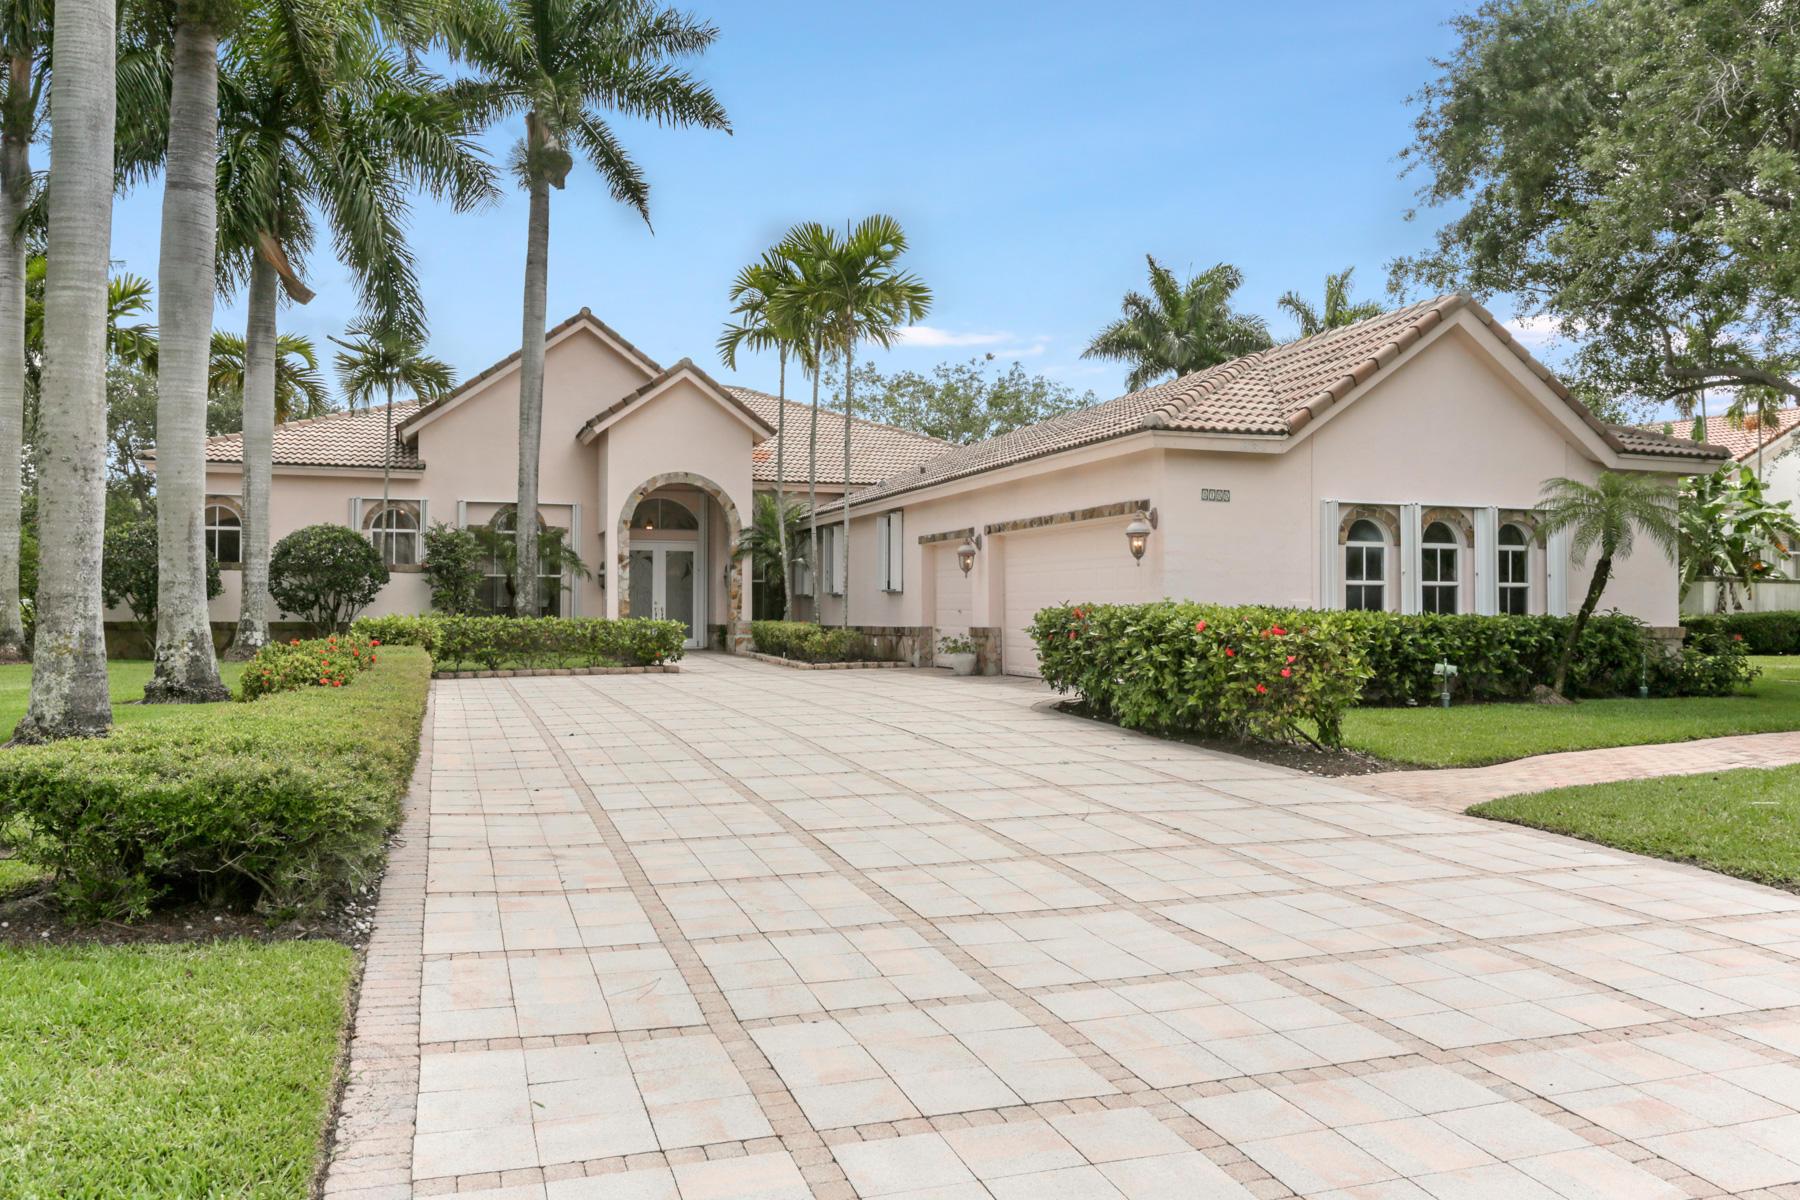 8188 Lakeview Drive West Palm Beach, FL 33412